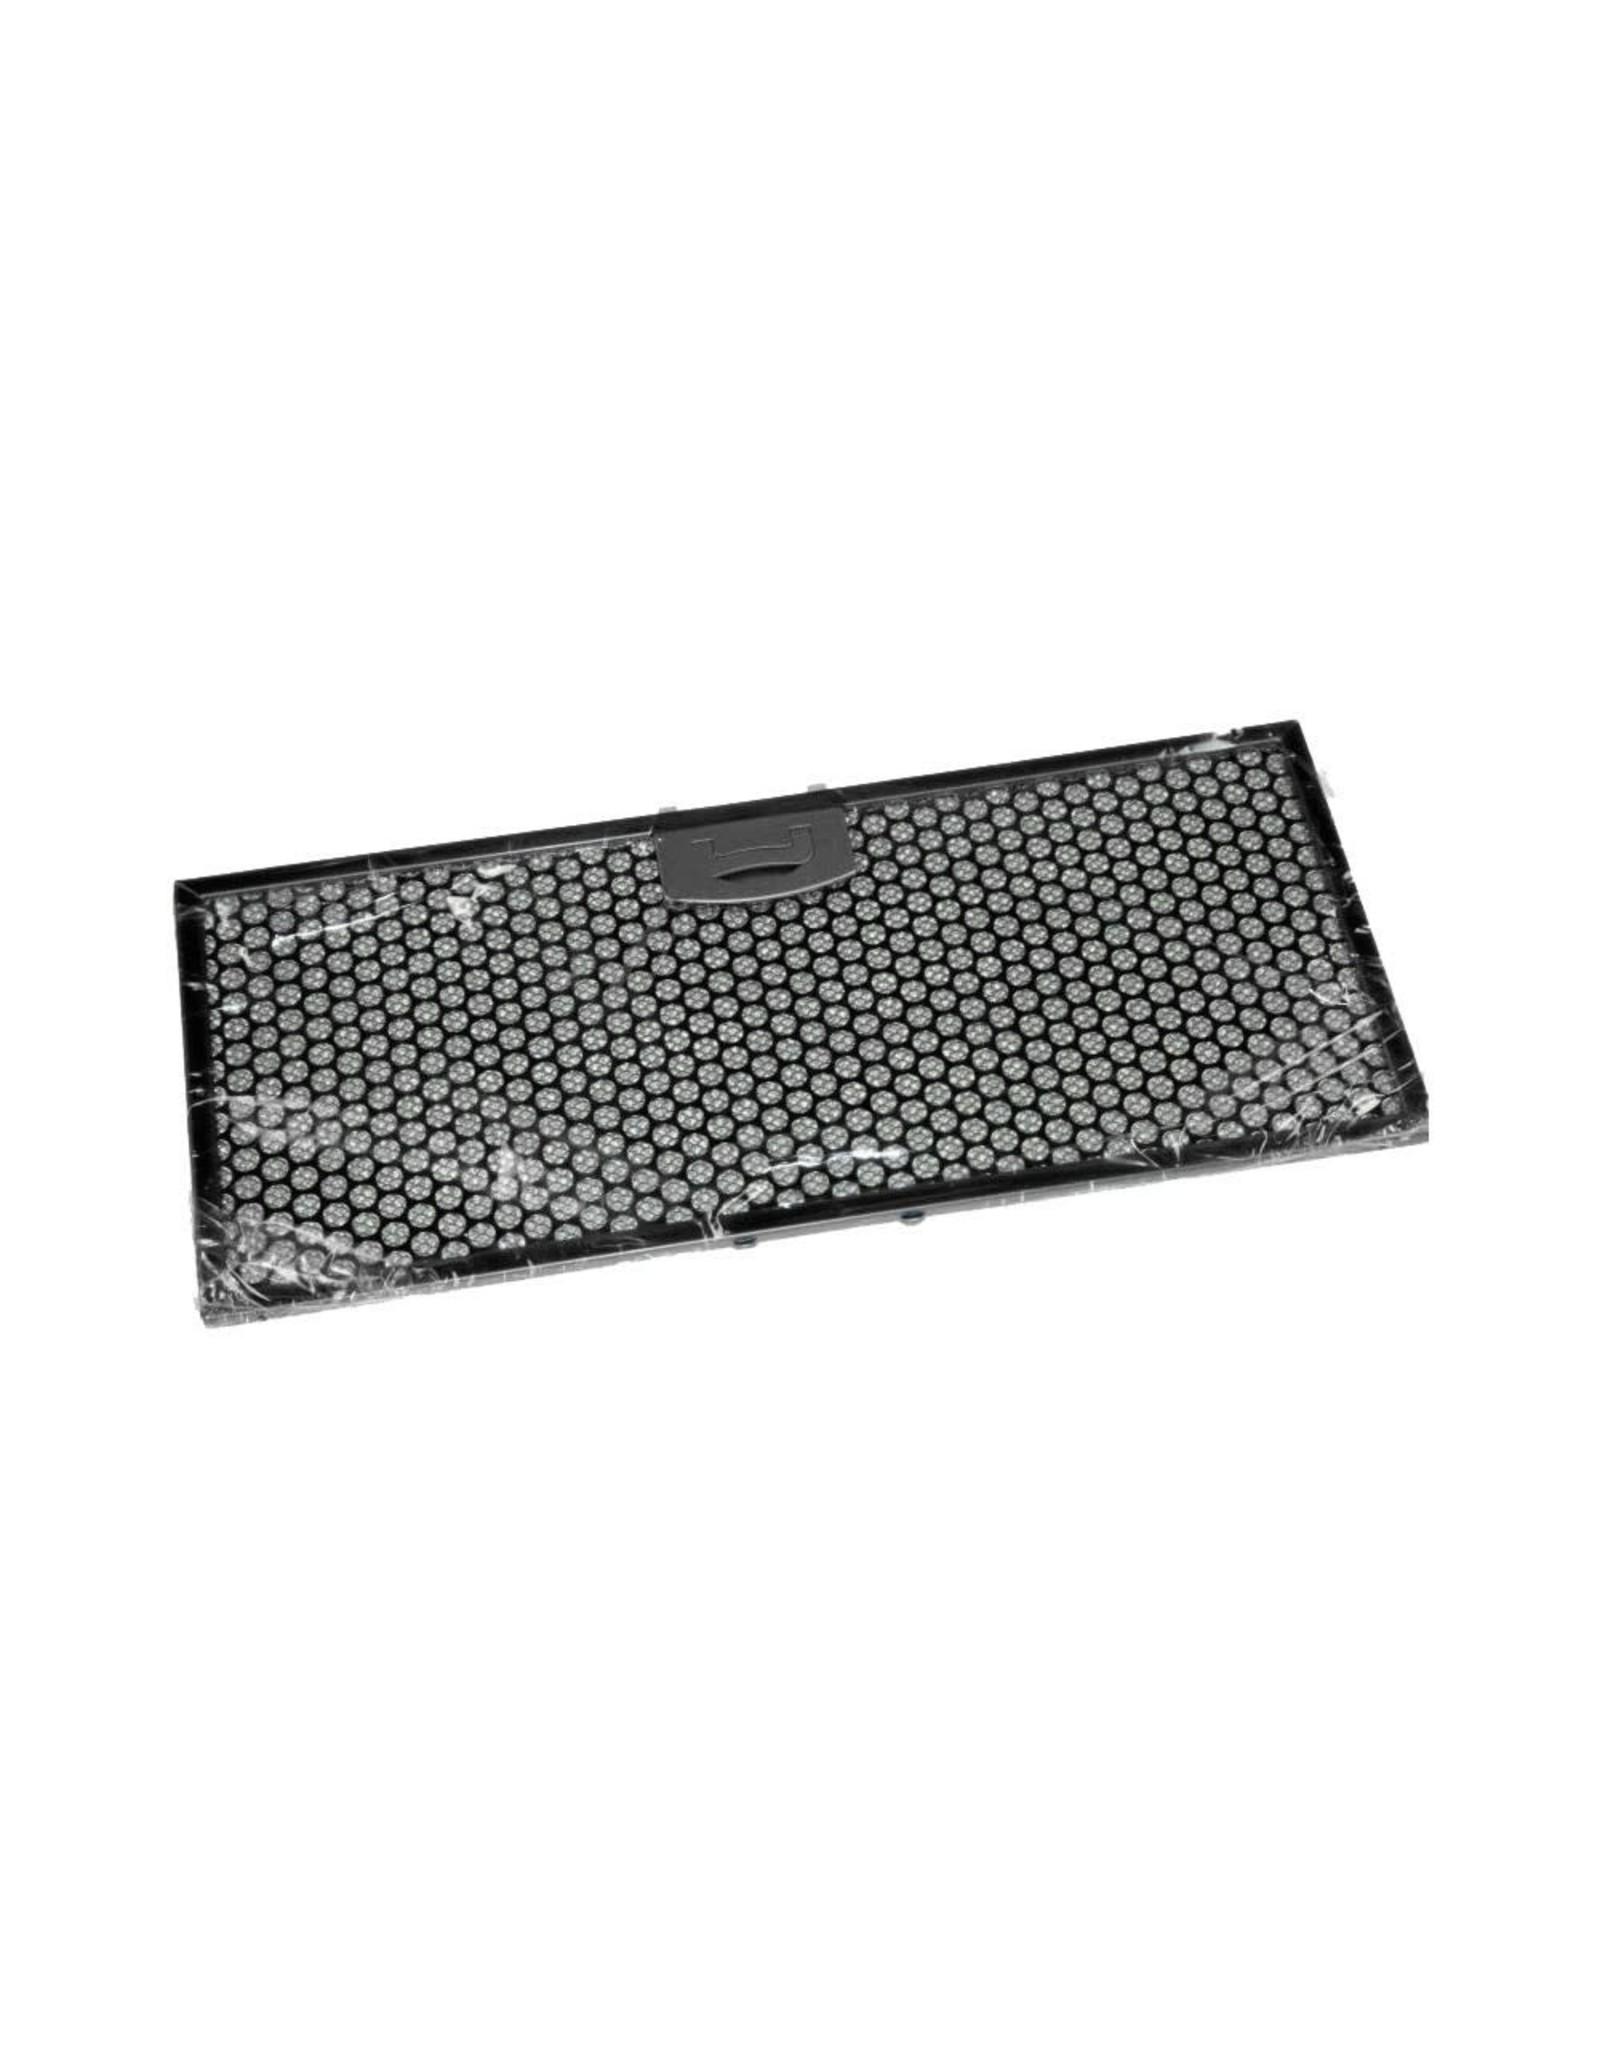 Atag Metalen filter